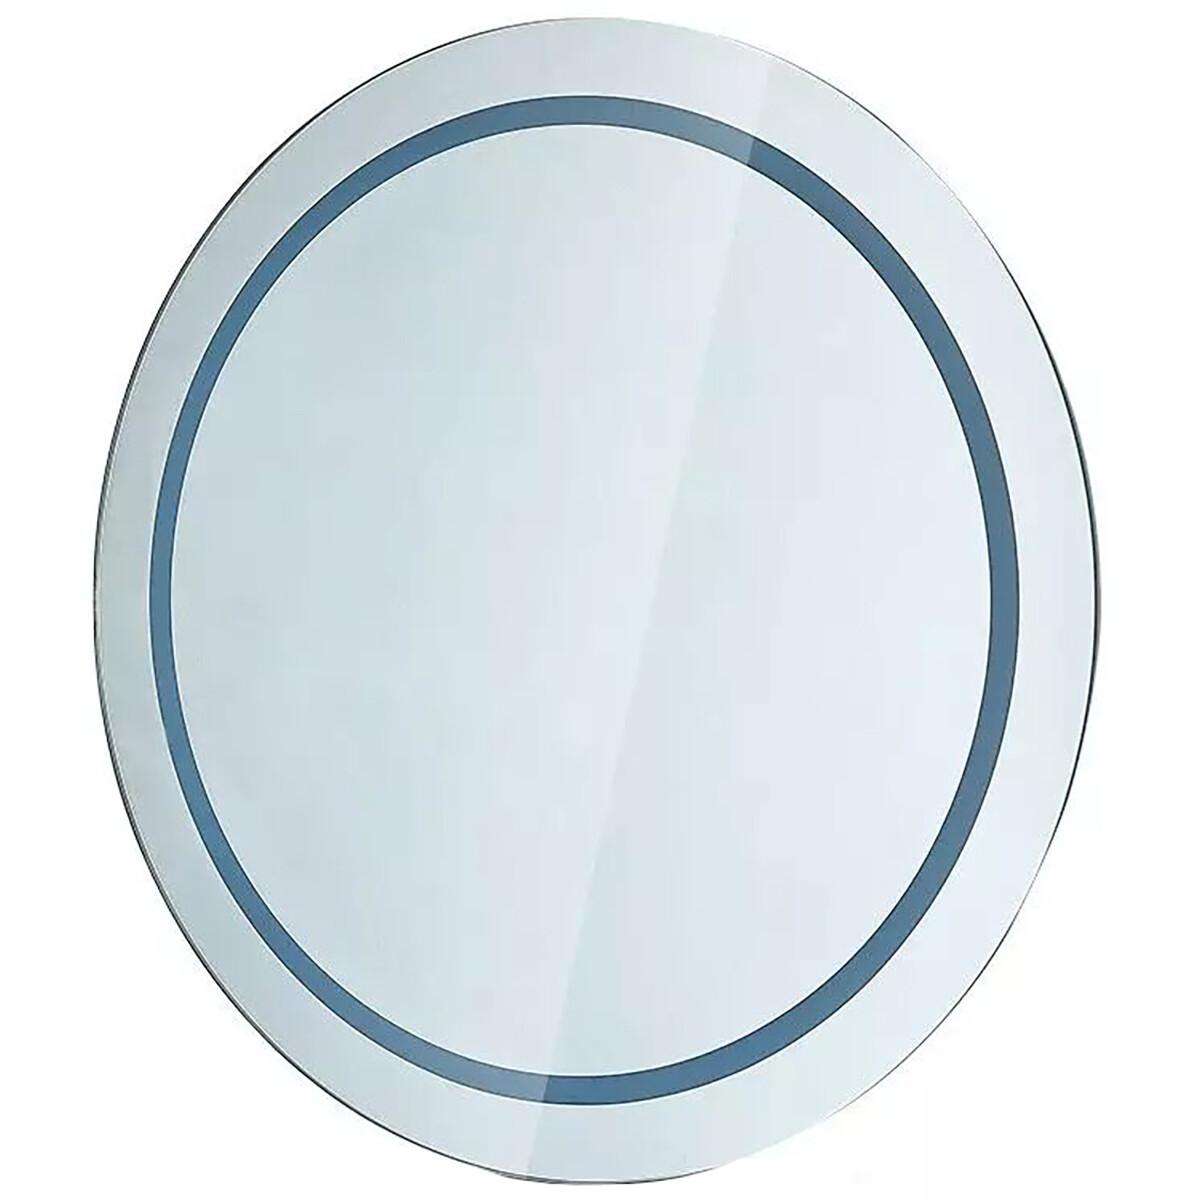 LED Badkamerspiegel - Viron Mirron - Ø60cm - Rond - Anti Condens - Helder/Koud Wit 6400K